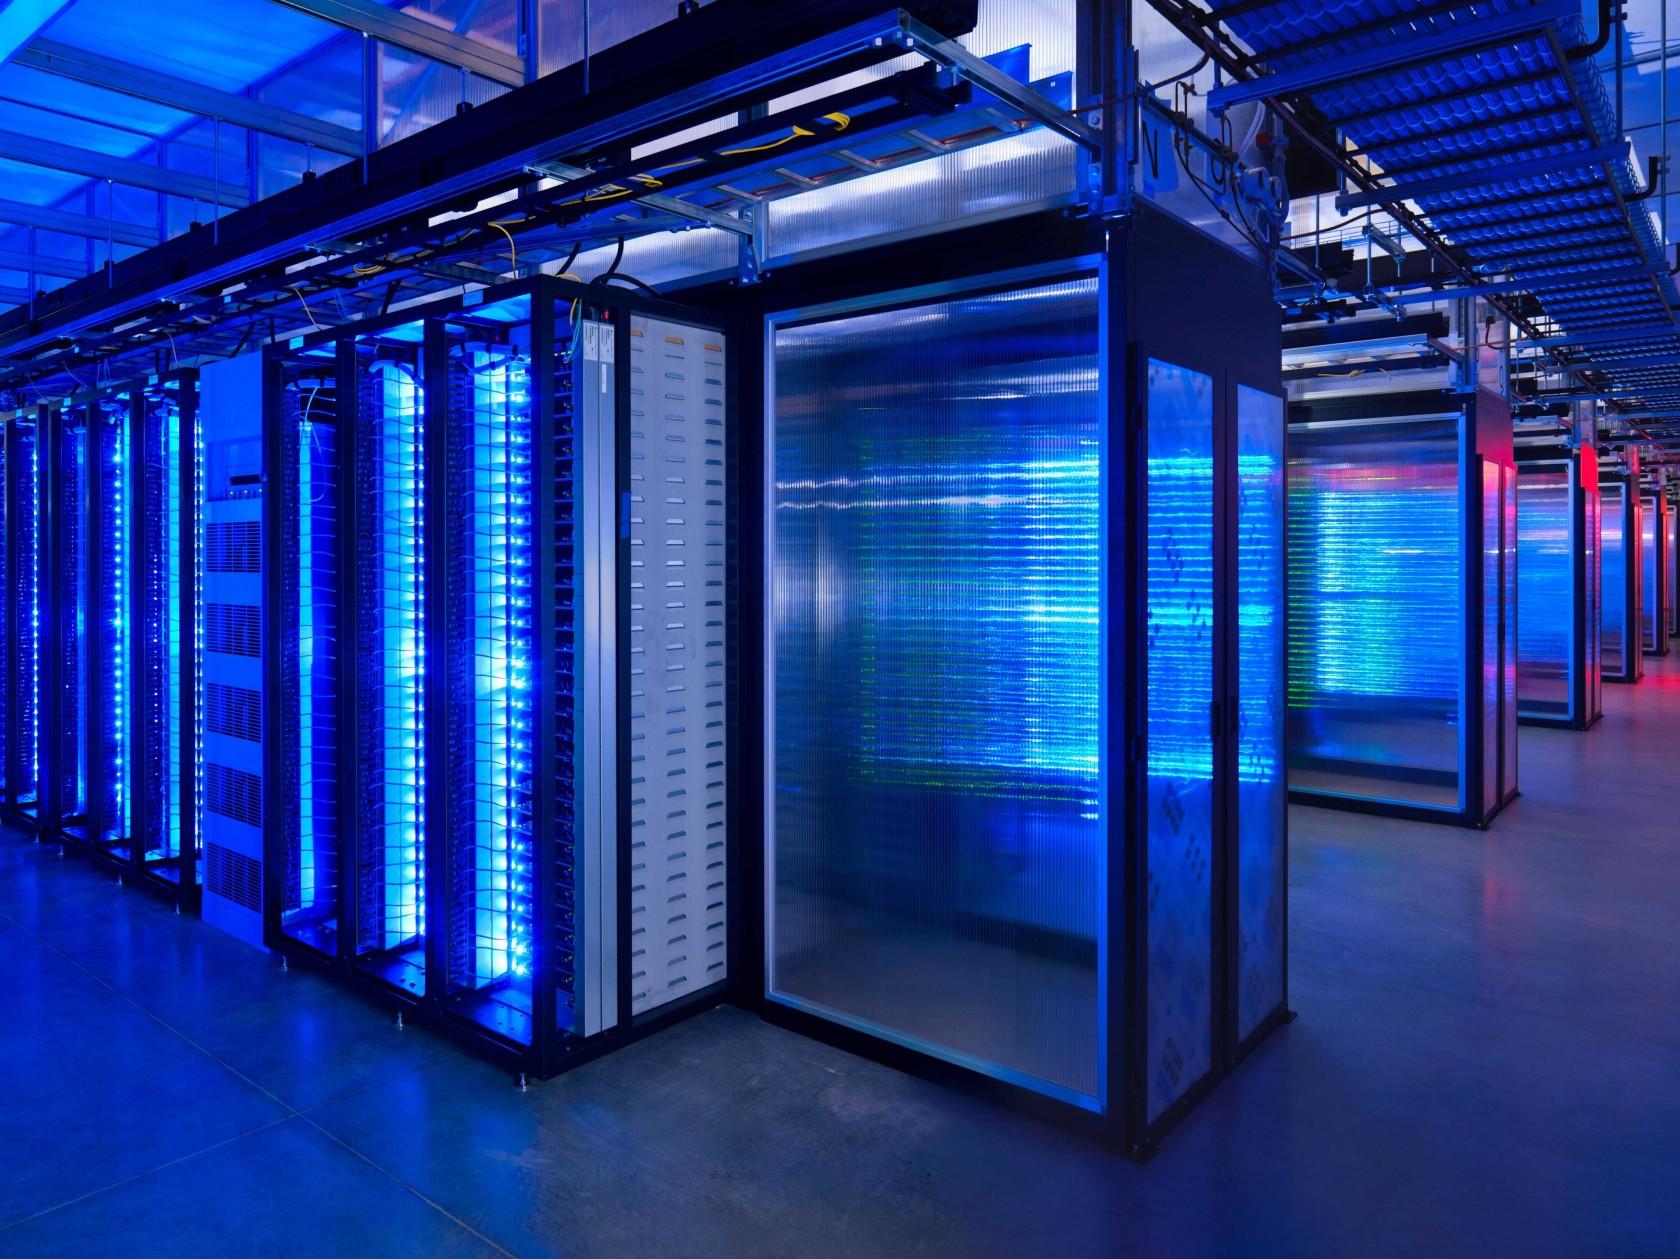 francis pelland building a data warehouse